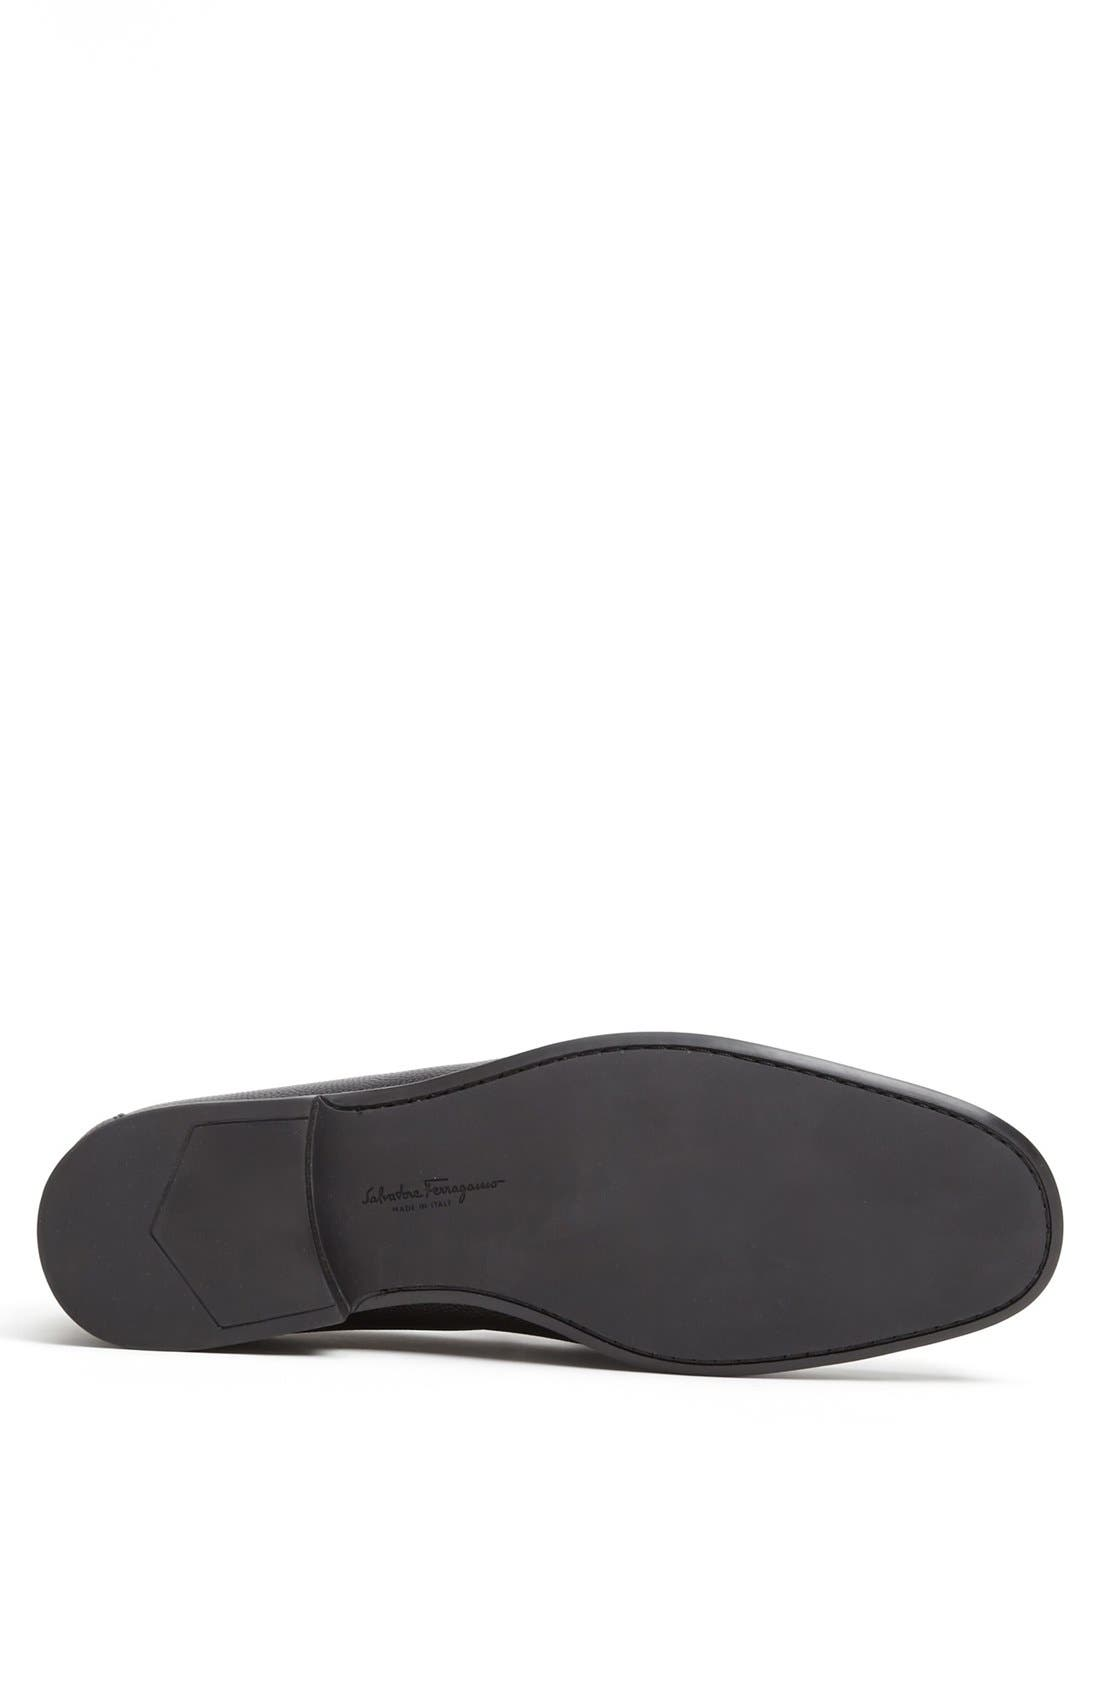 'Regal' Pebbled Leather Loafer,                             Alternate thumbnail 3, color,                             001